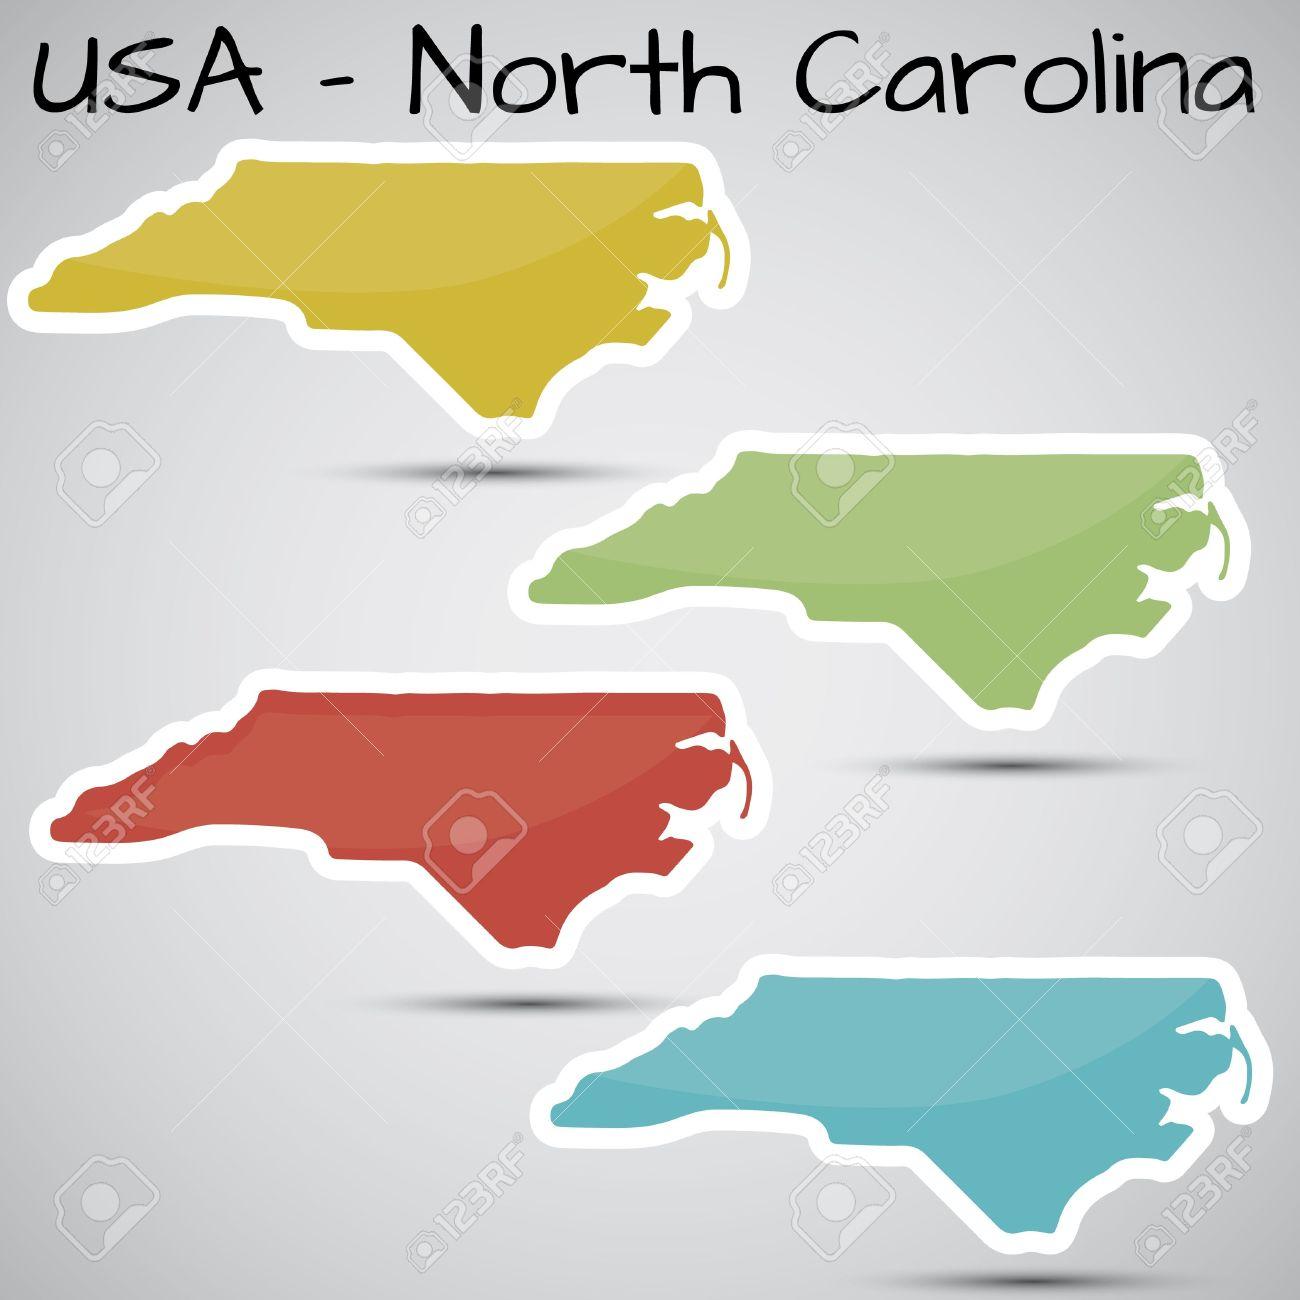 North carolina map clipart cartoon jpg royalty free 1,732 North Carolina Stock Illustrations, Cliparts And Royalty ... jpg royalty free